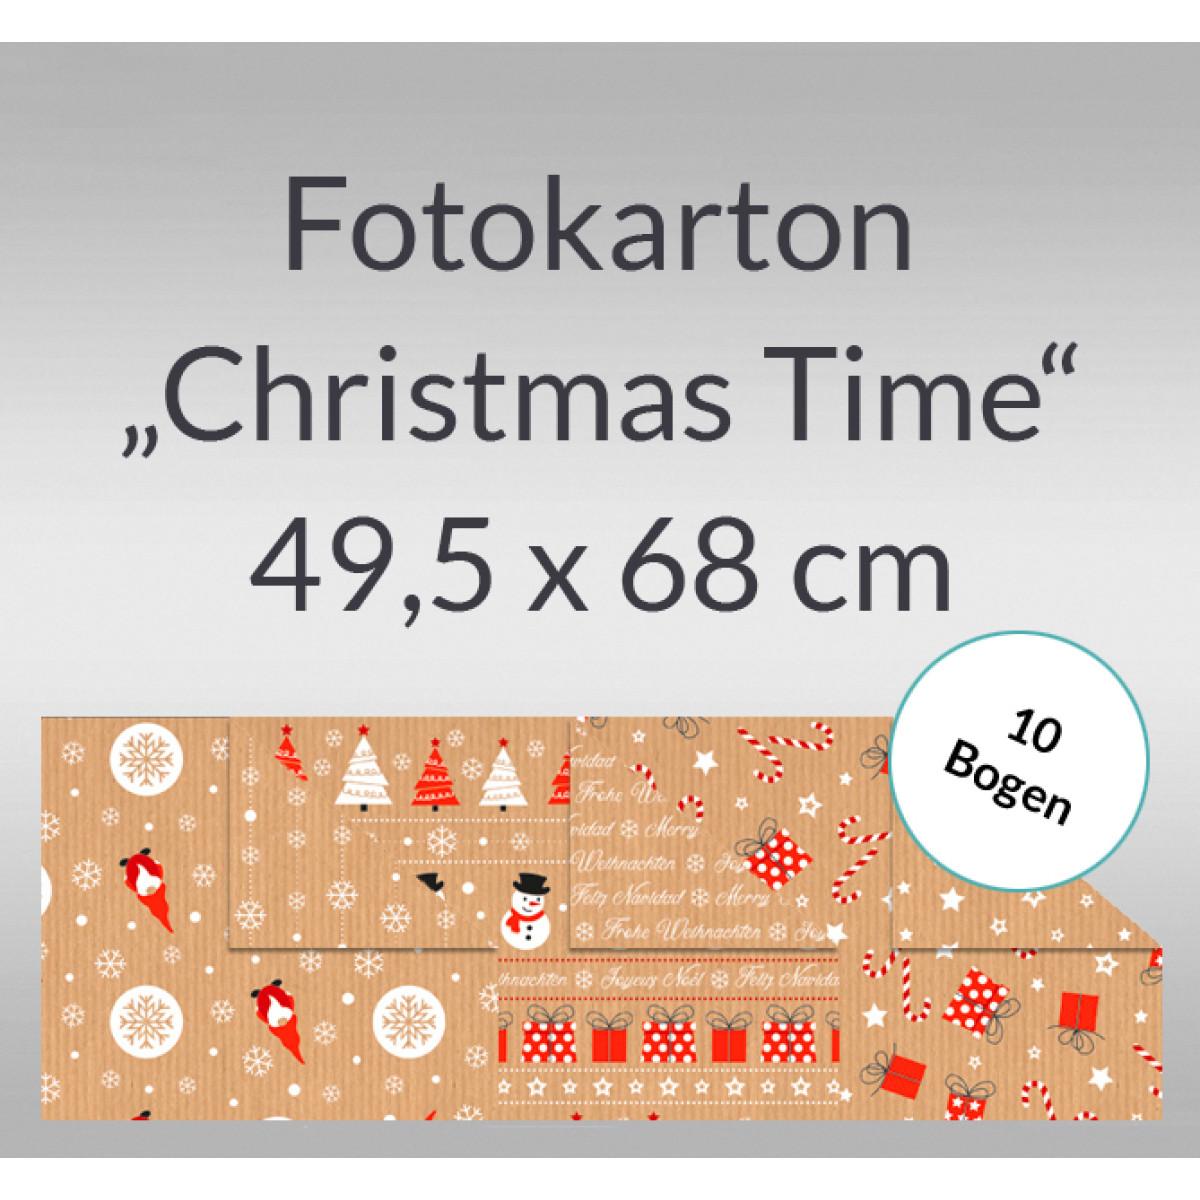 "Fotokarton ""Christmas Time"" 49,5 x 68 cm - 10 Bogen"